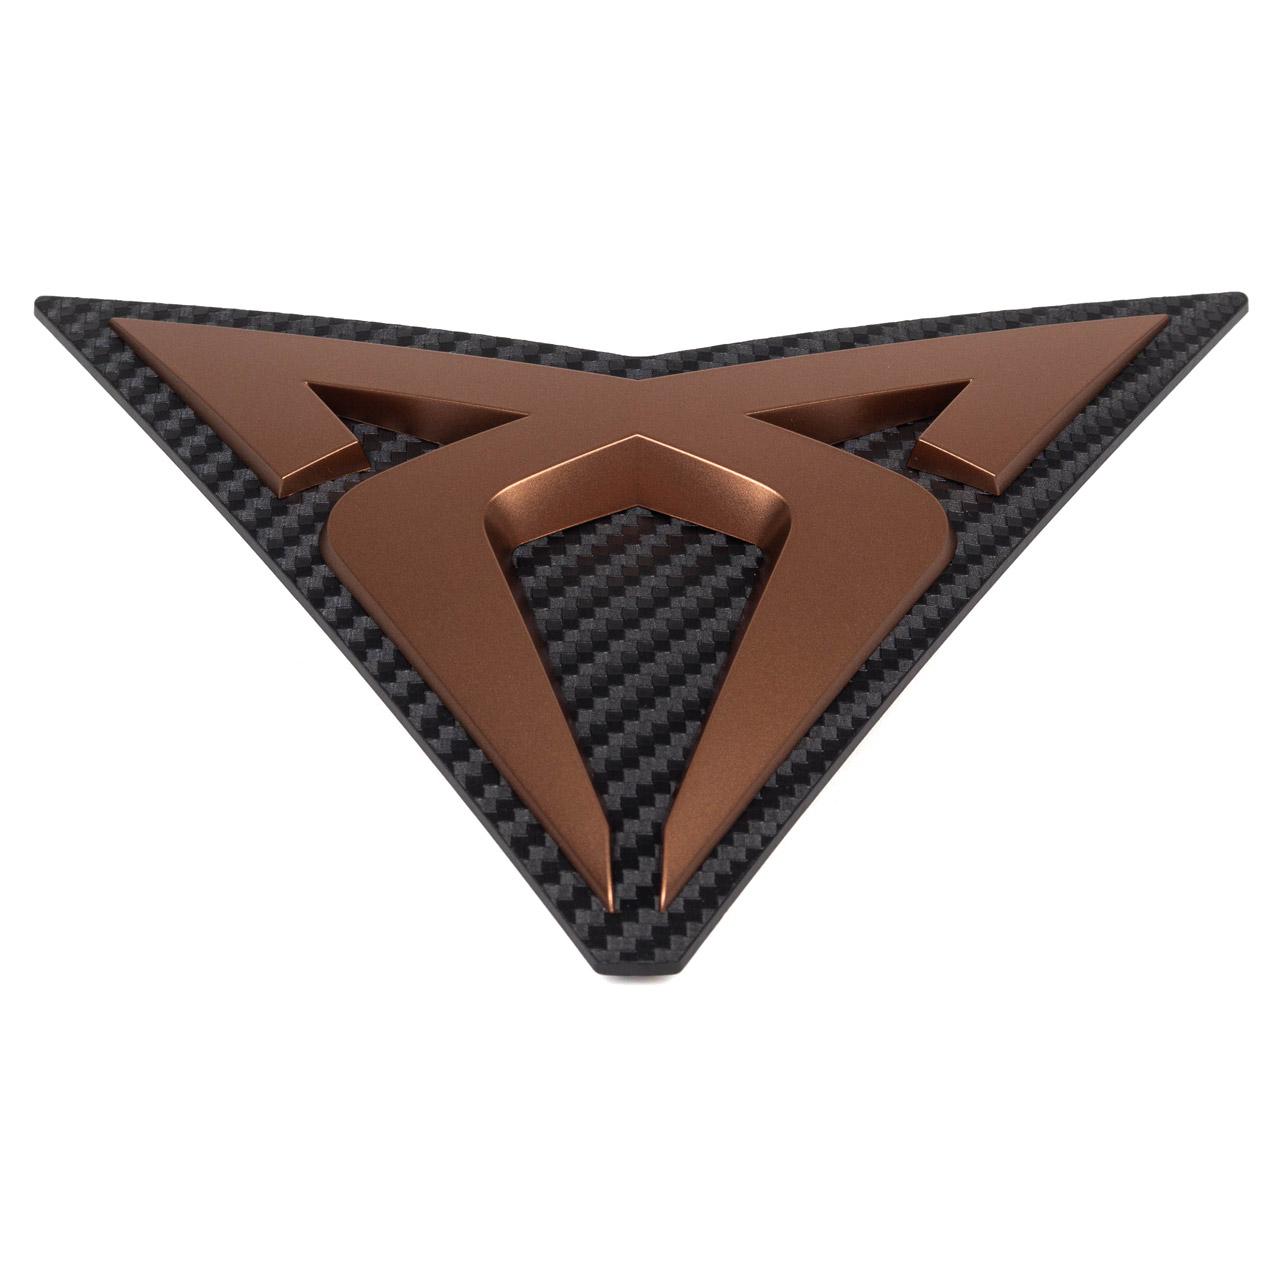 ORIGINAL Seat CUPRA Emblem Logo Kühlergrill Kupfer ATteca KH7 KHP 575853679J RZH